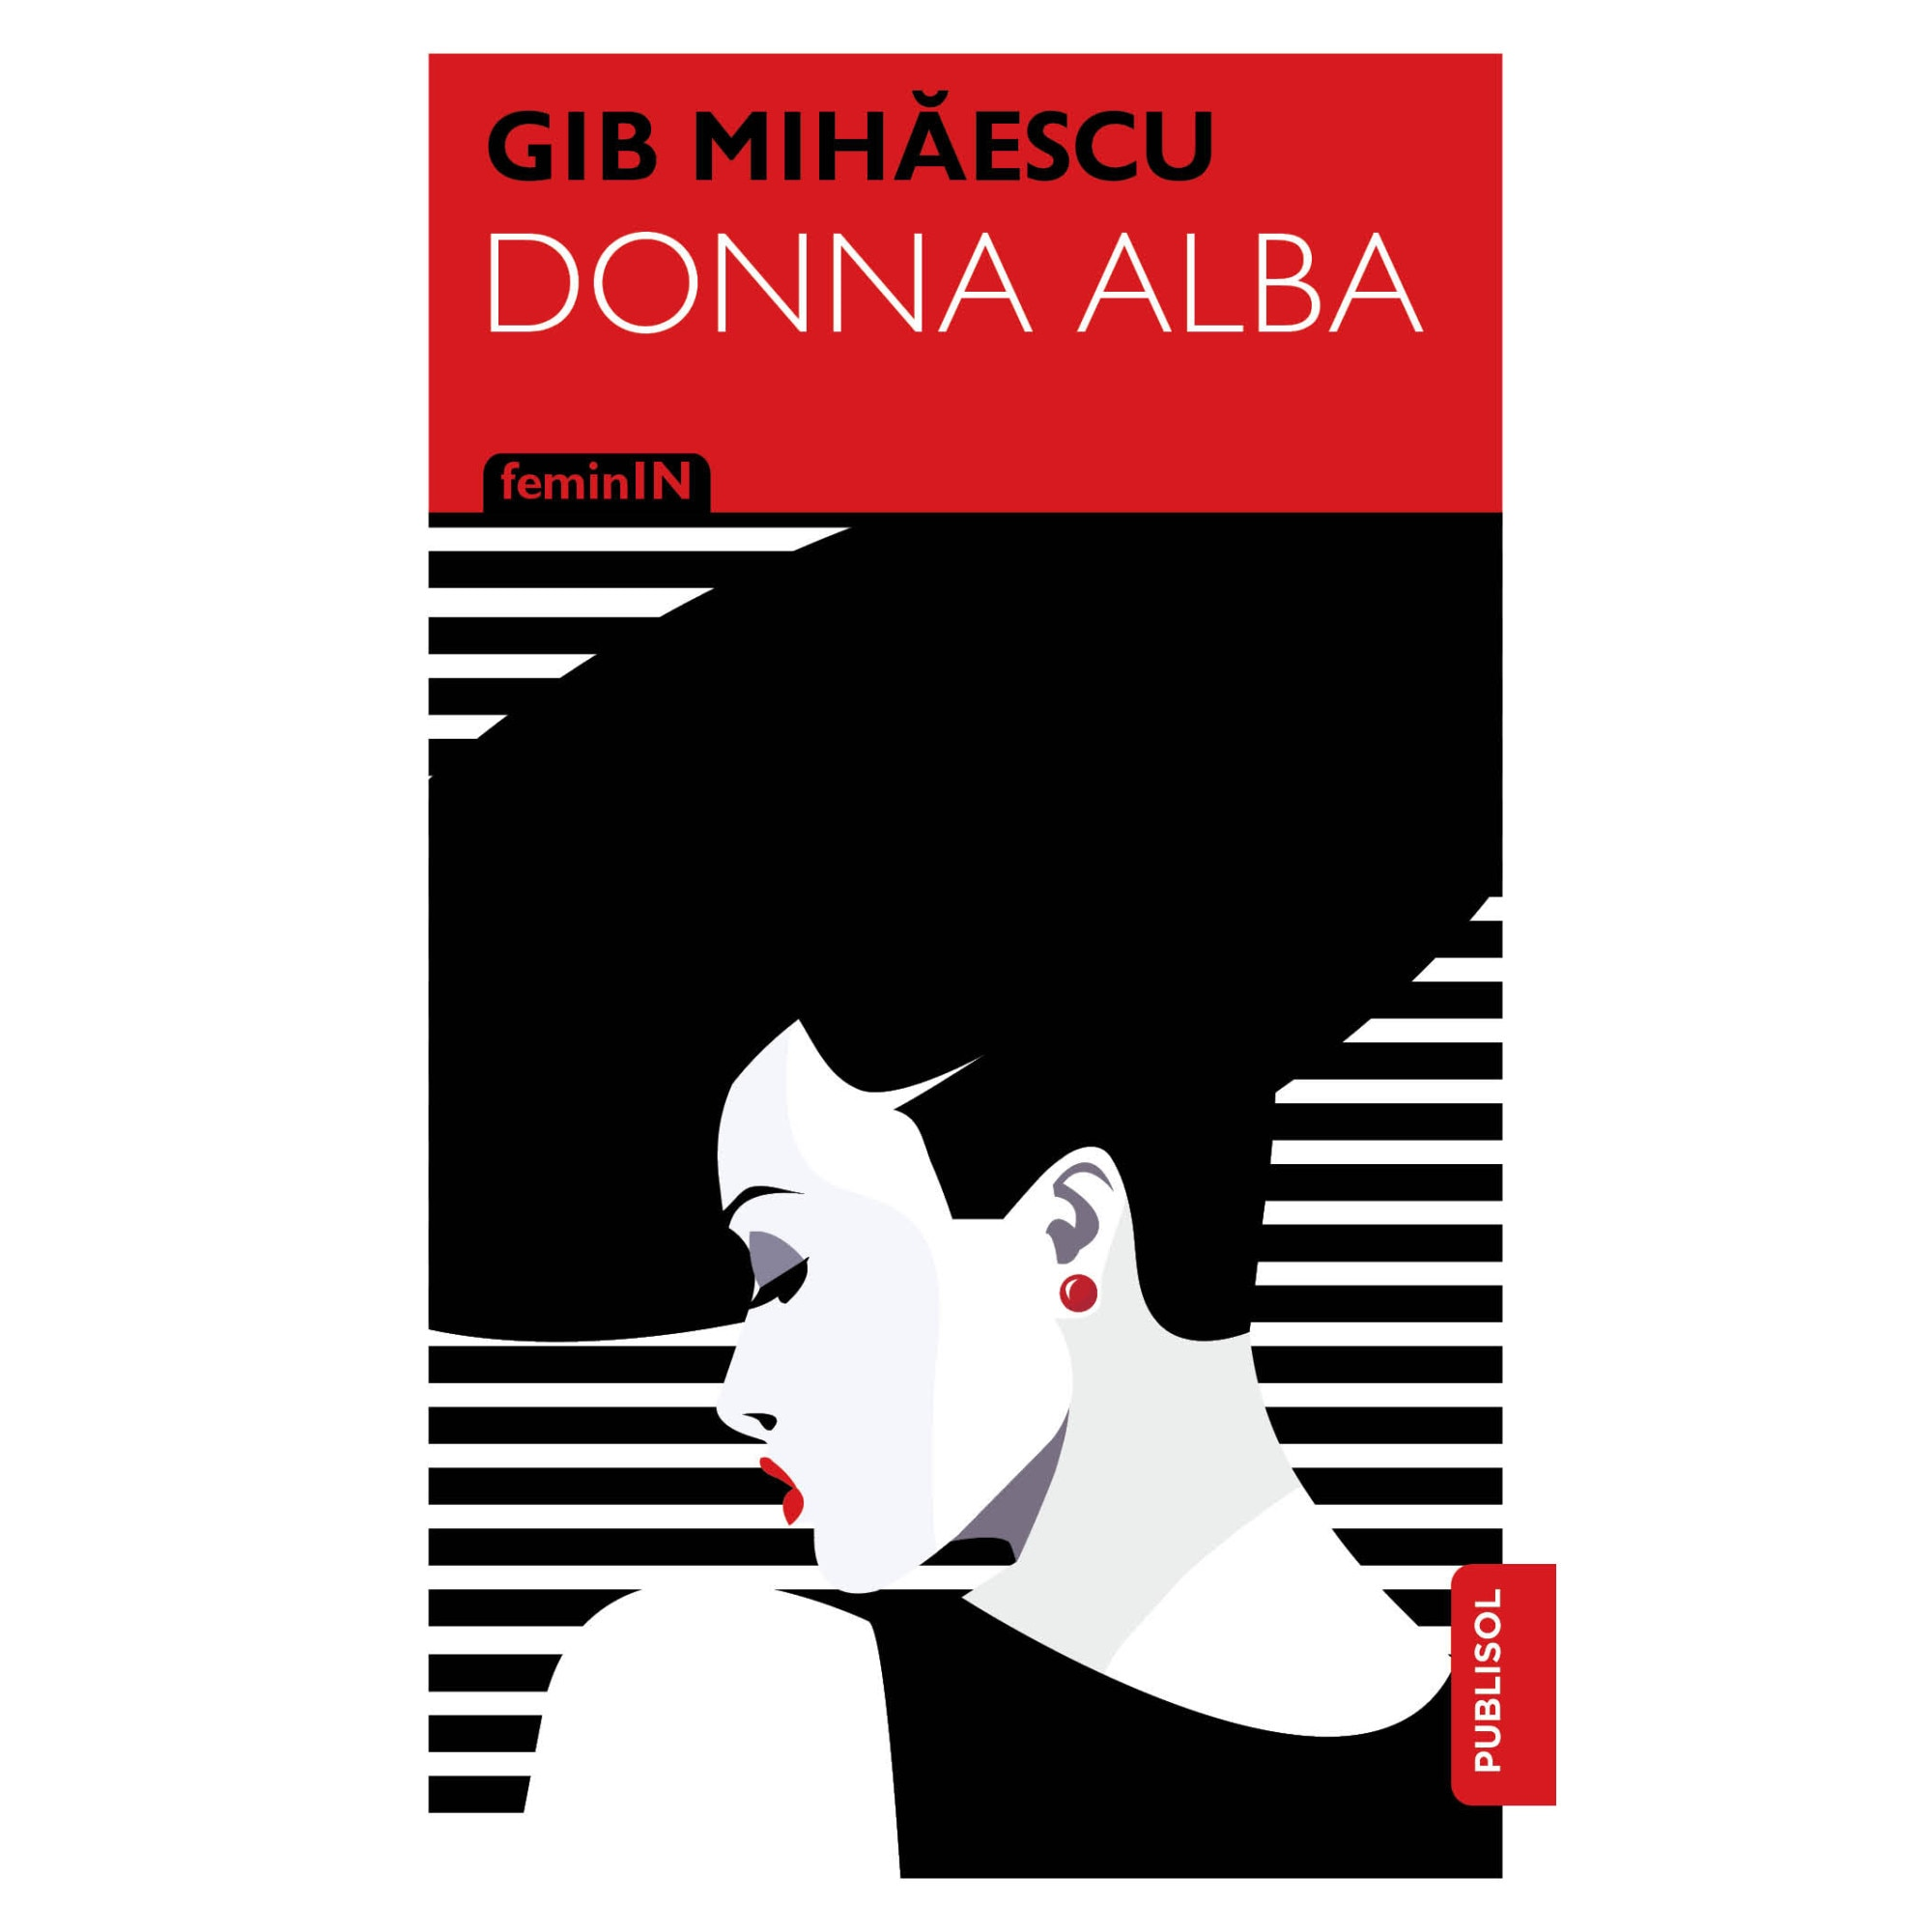 Donna Alba | Gib Mihaescu